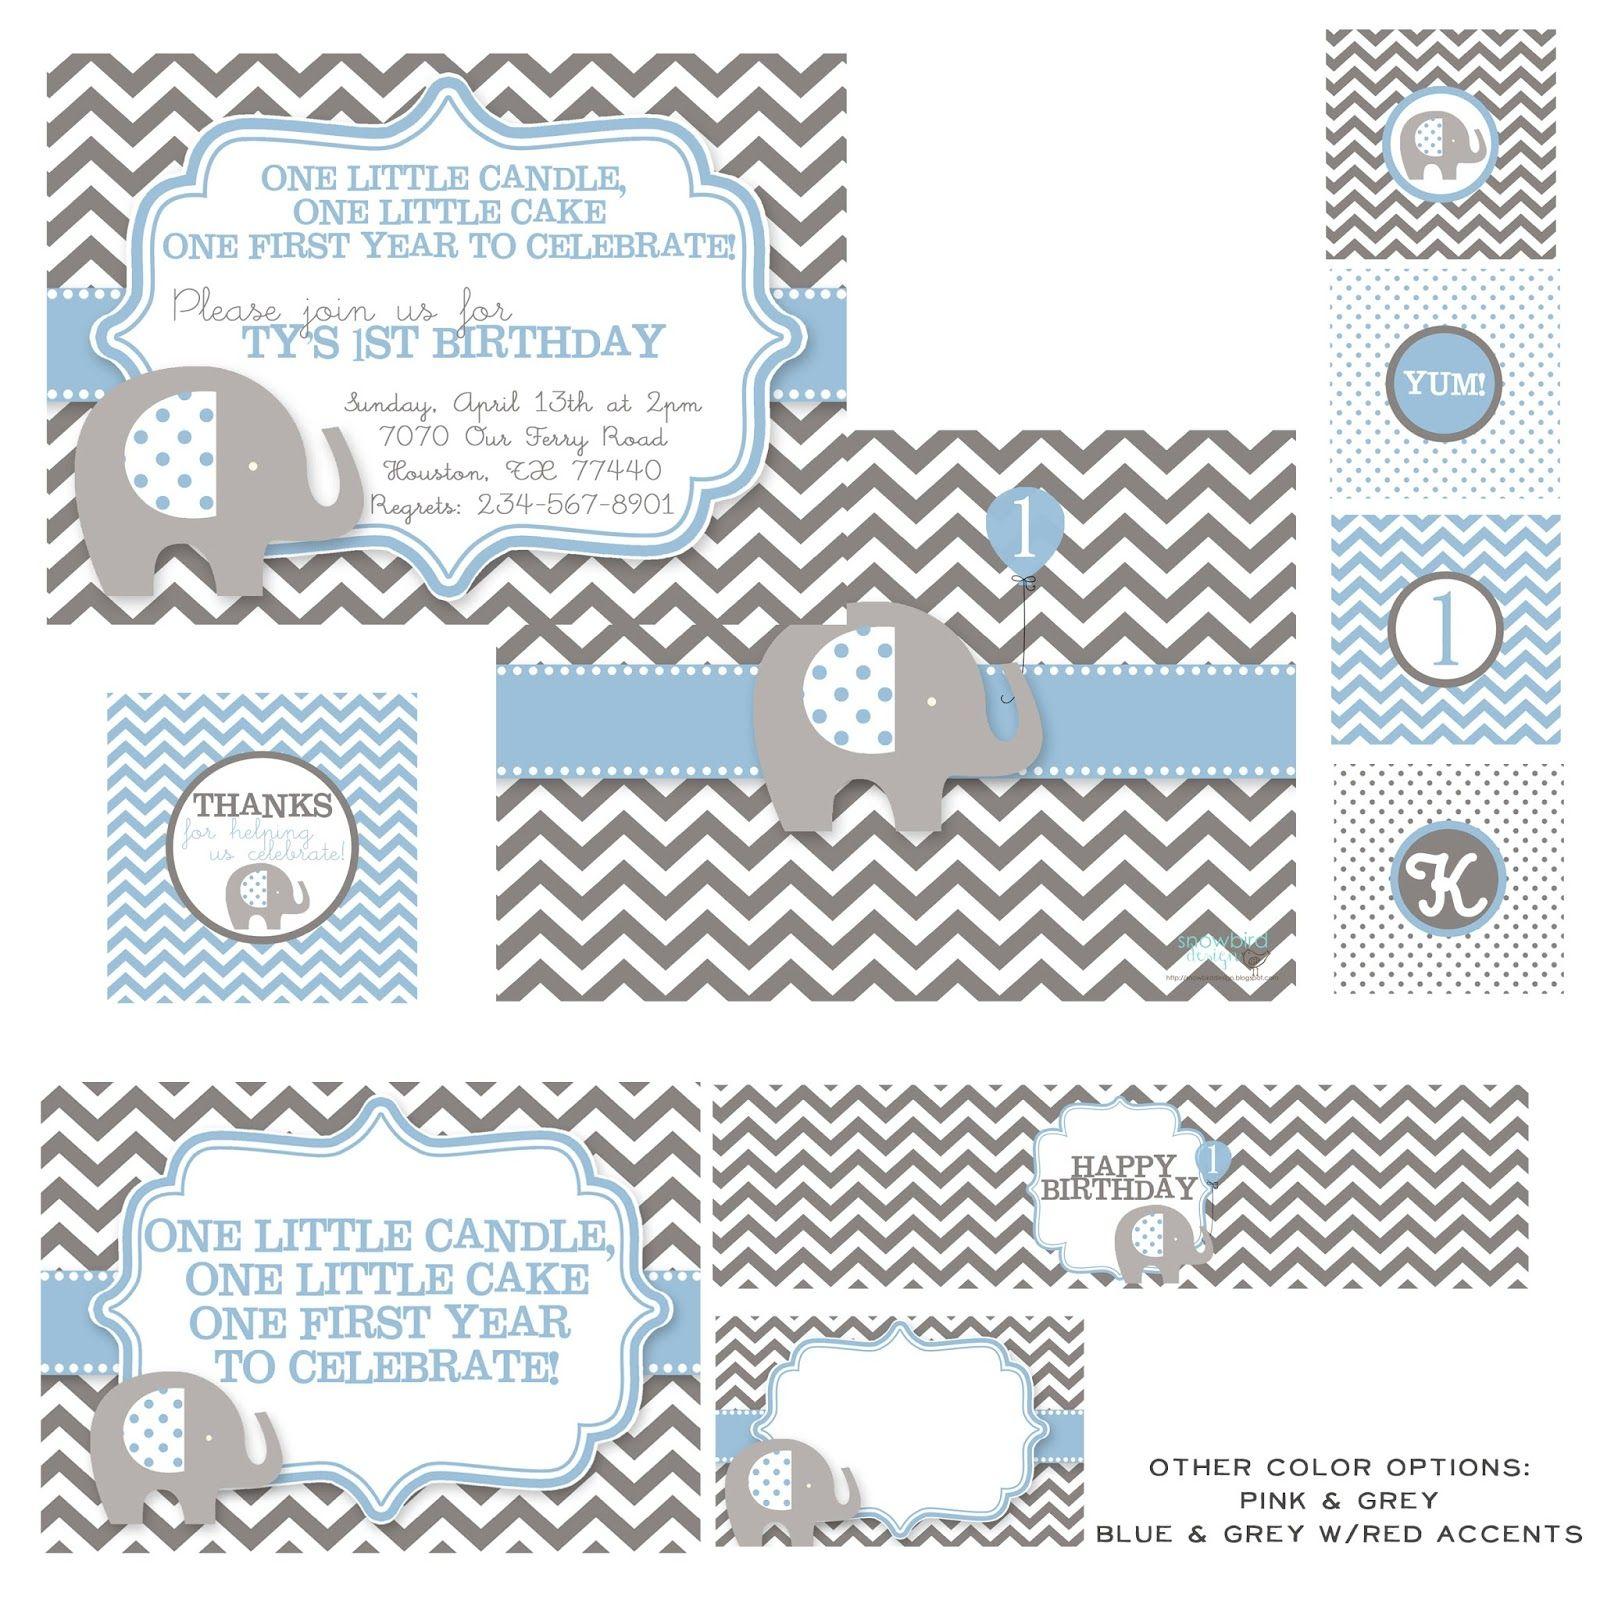 Elephant Theme 3rd Birthday Party: Snowbird Design: Boy Birthday Themes, Elephant Party